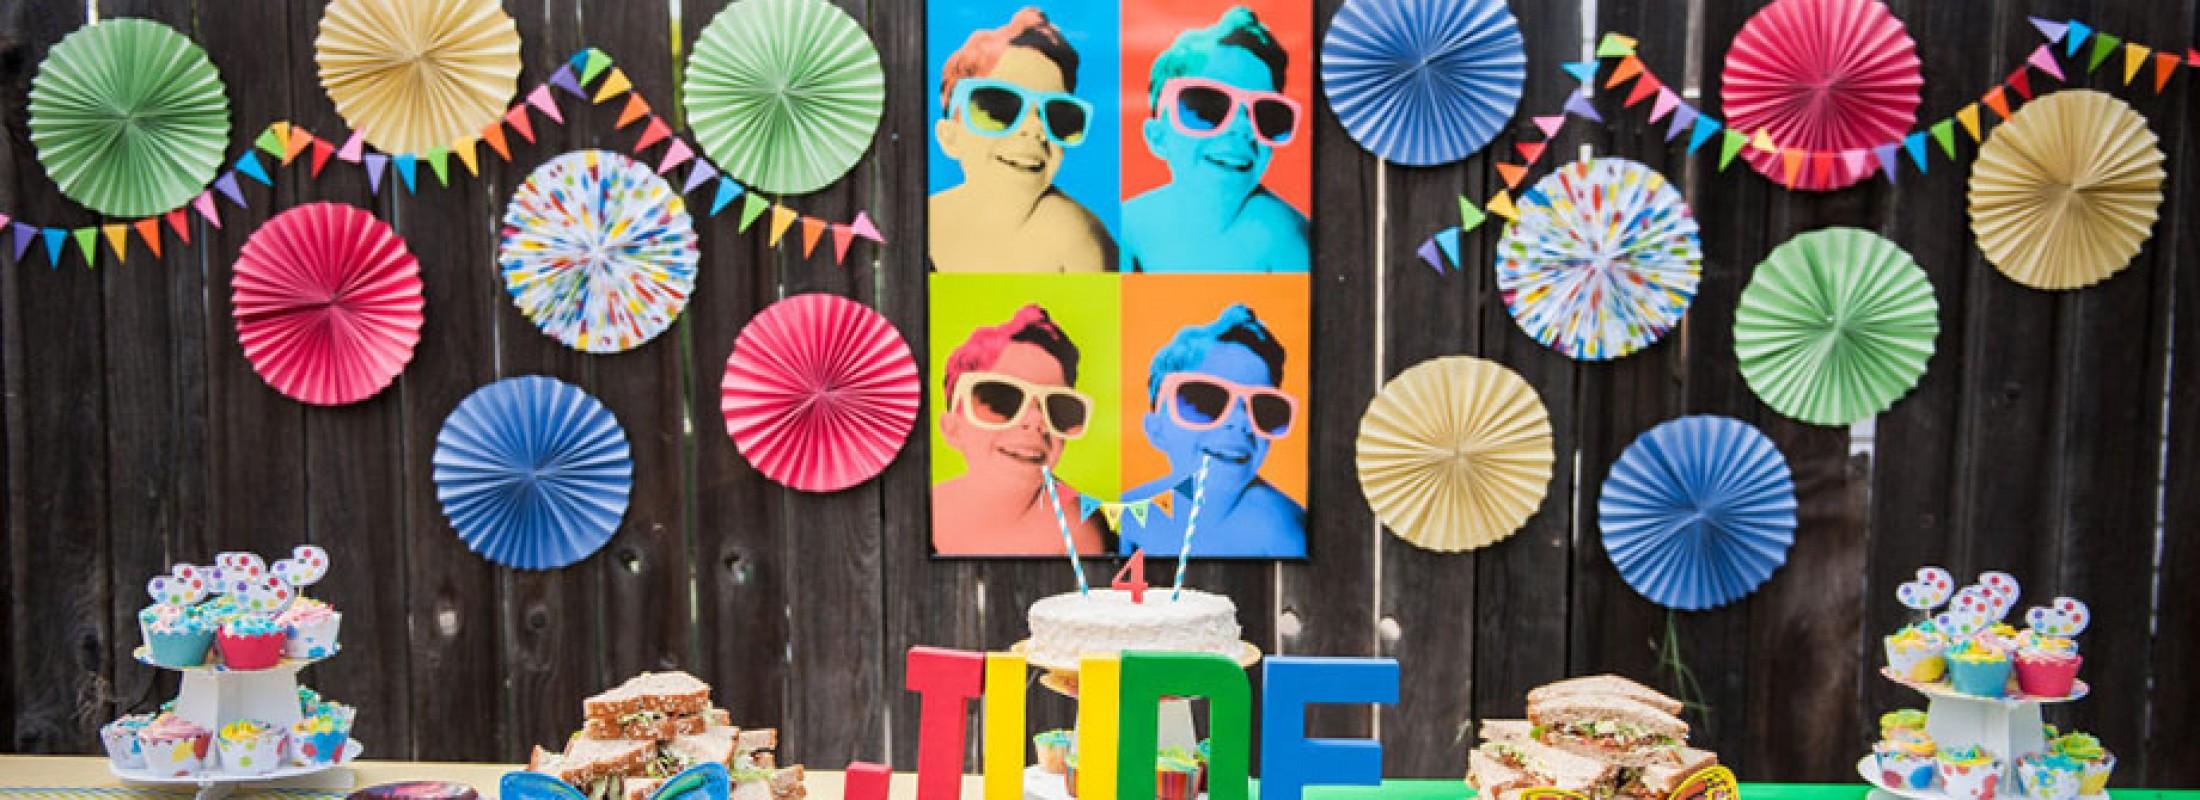 Trend Report: 10 Parties We Aboslutely Love